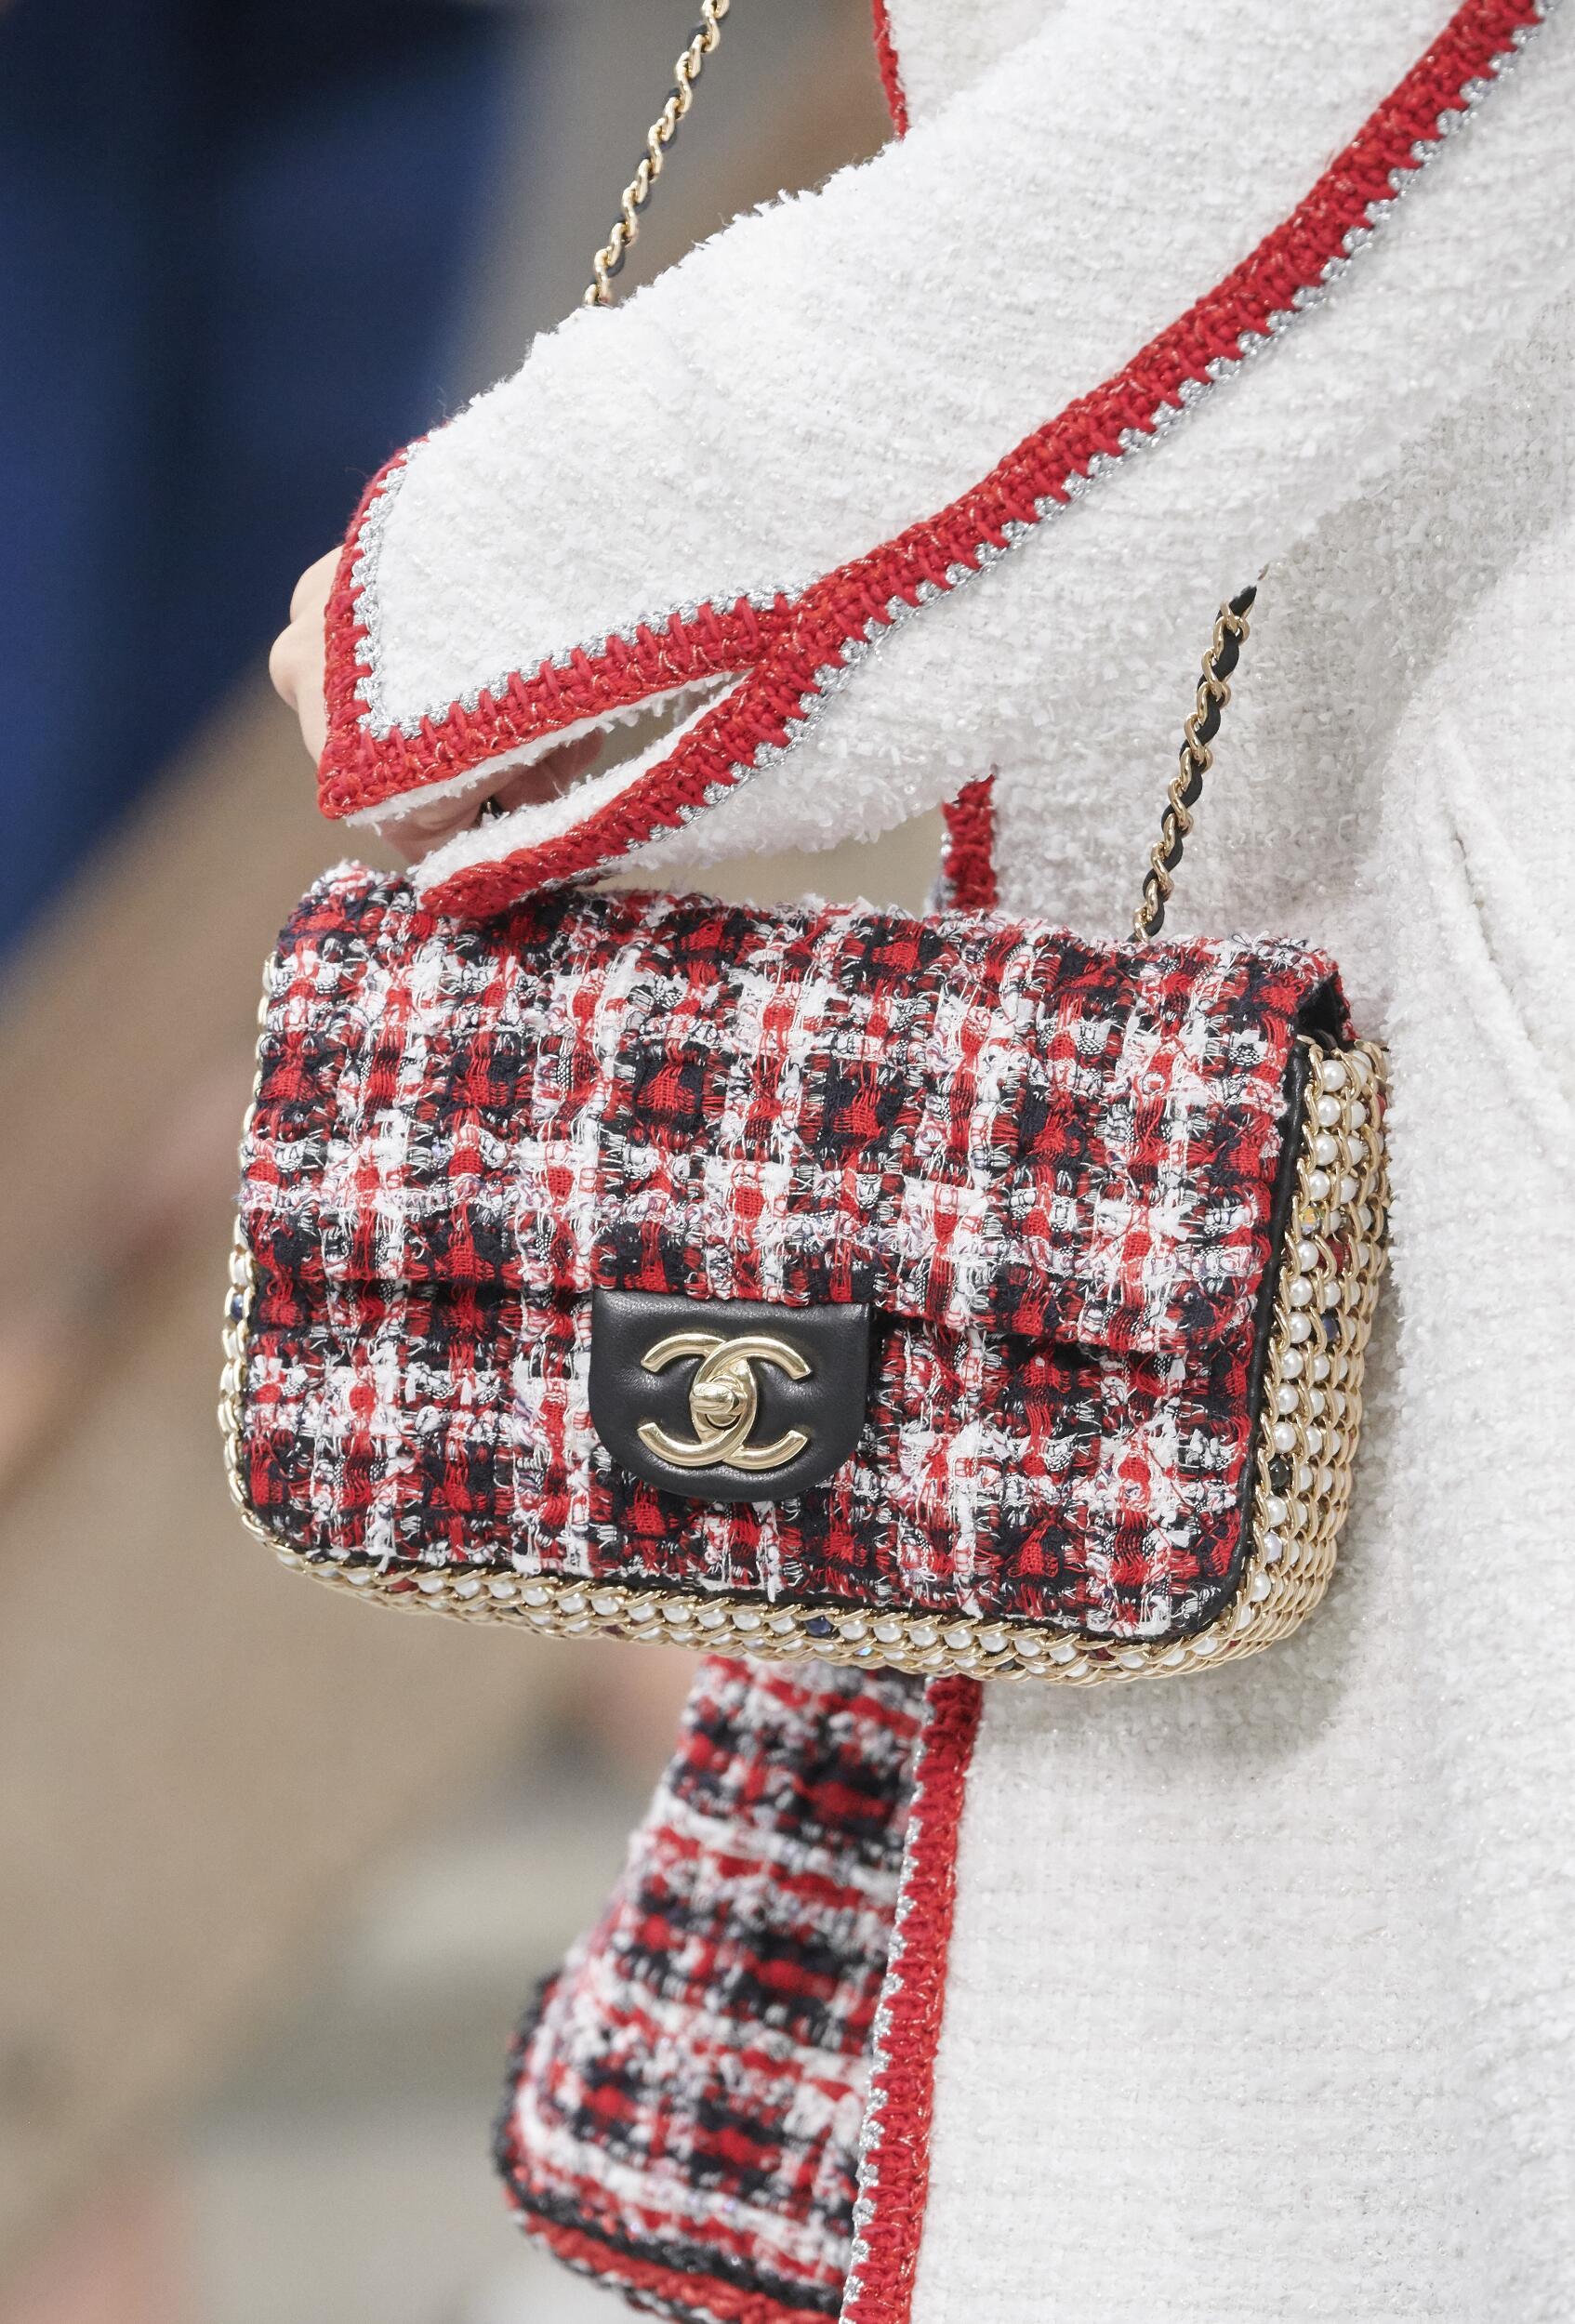 Chanel Summer 2020 Bag